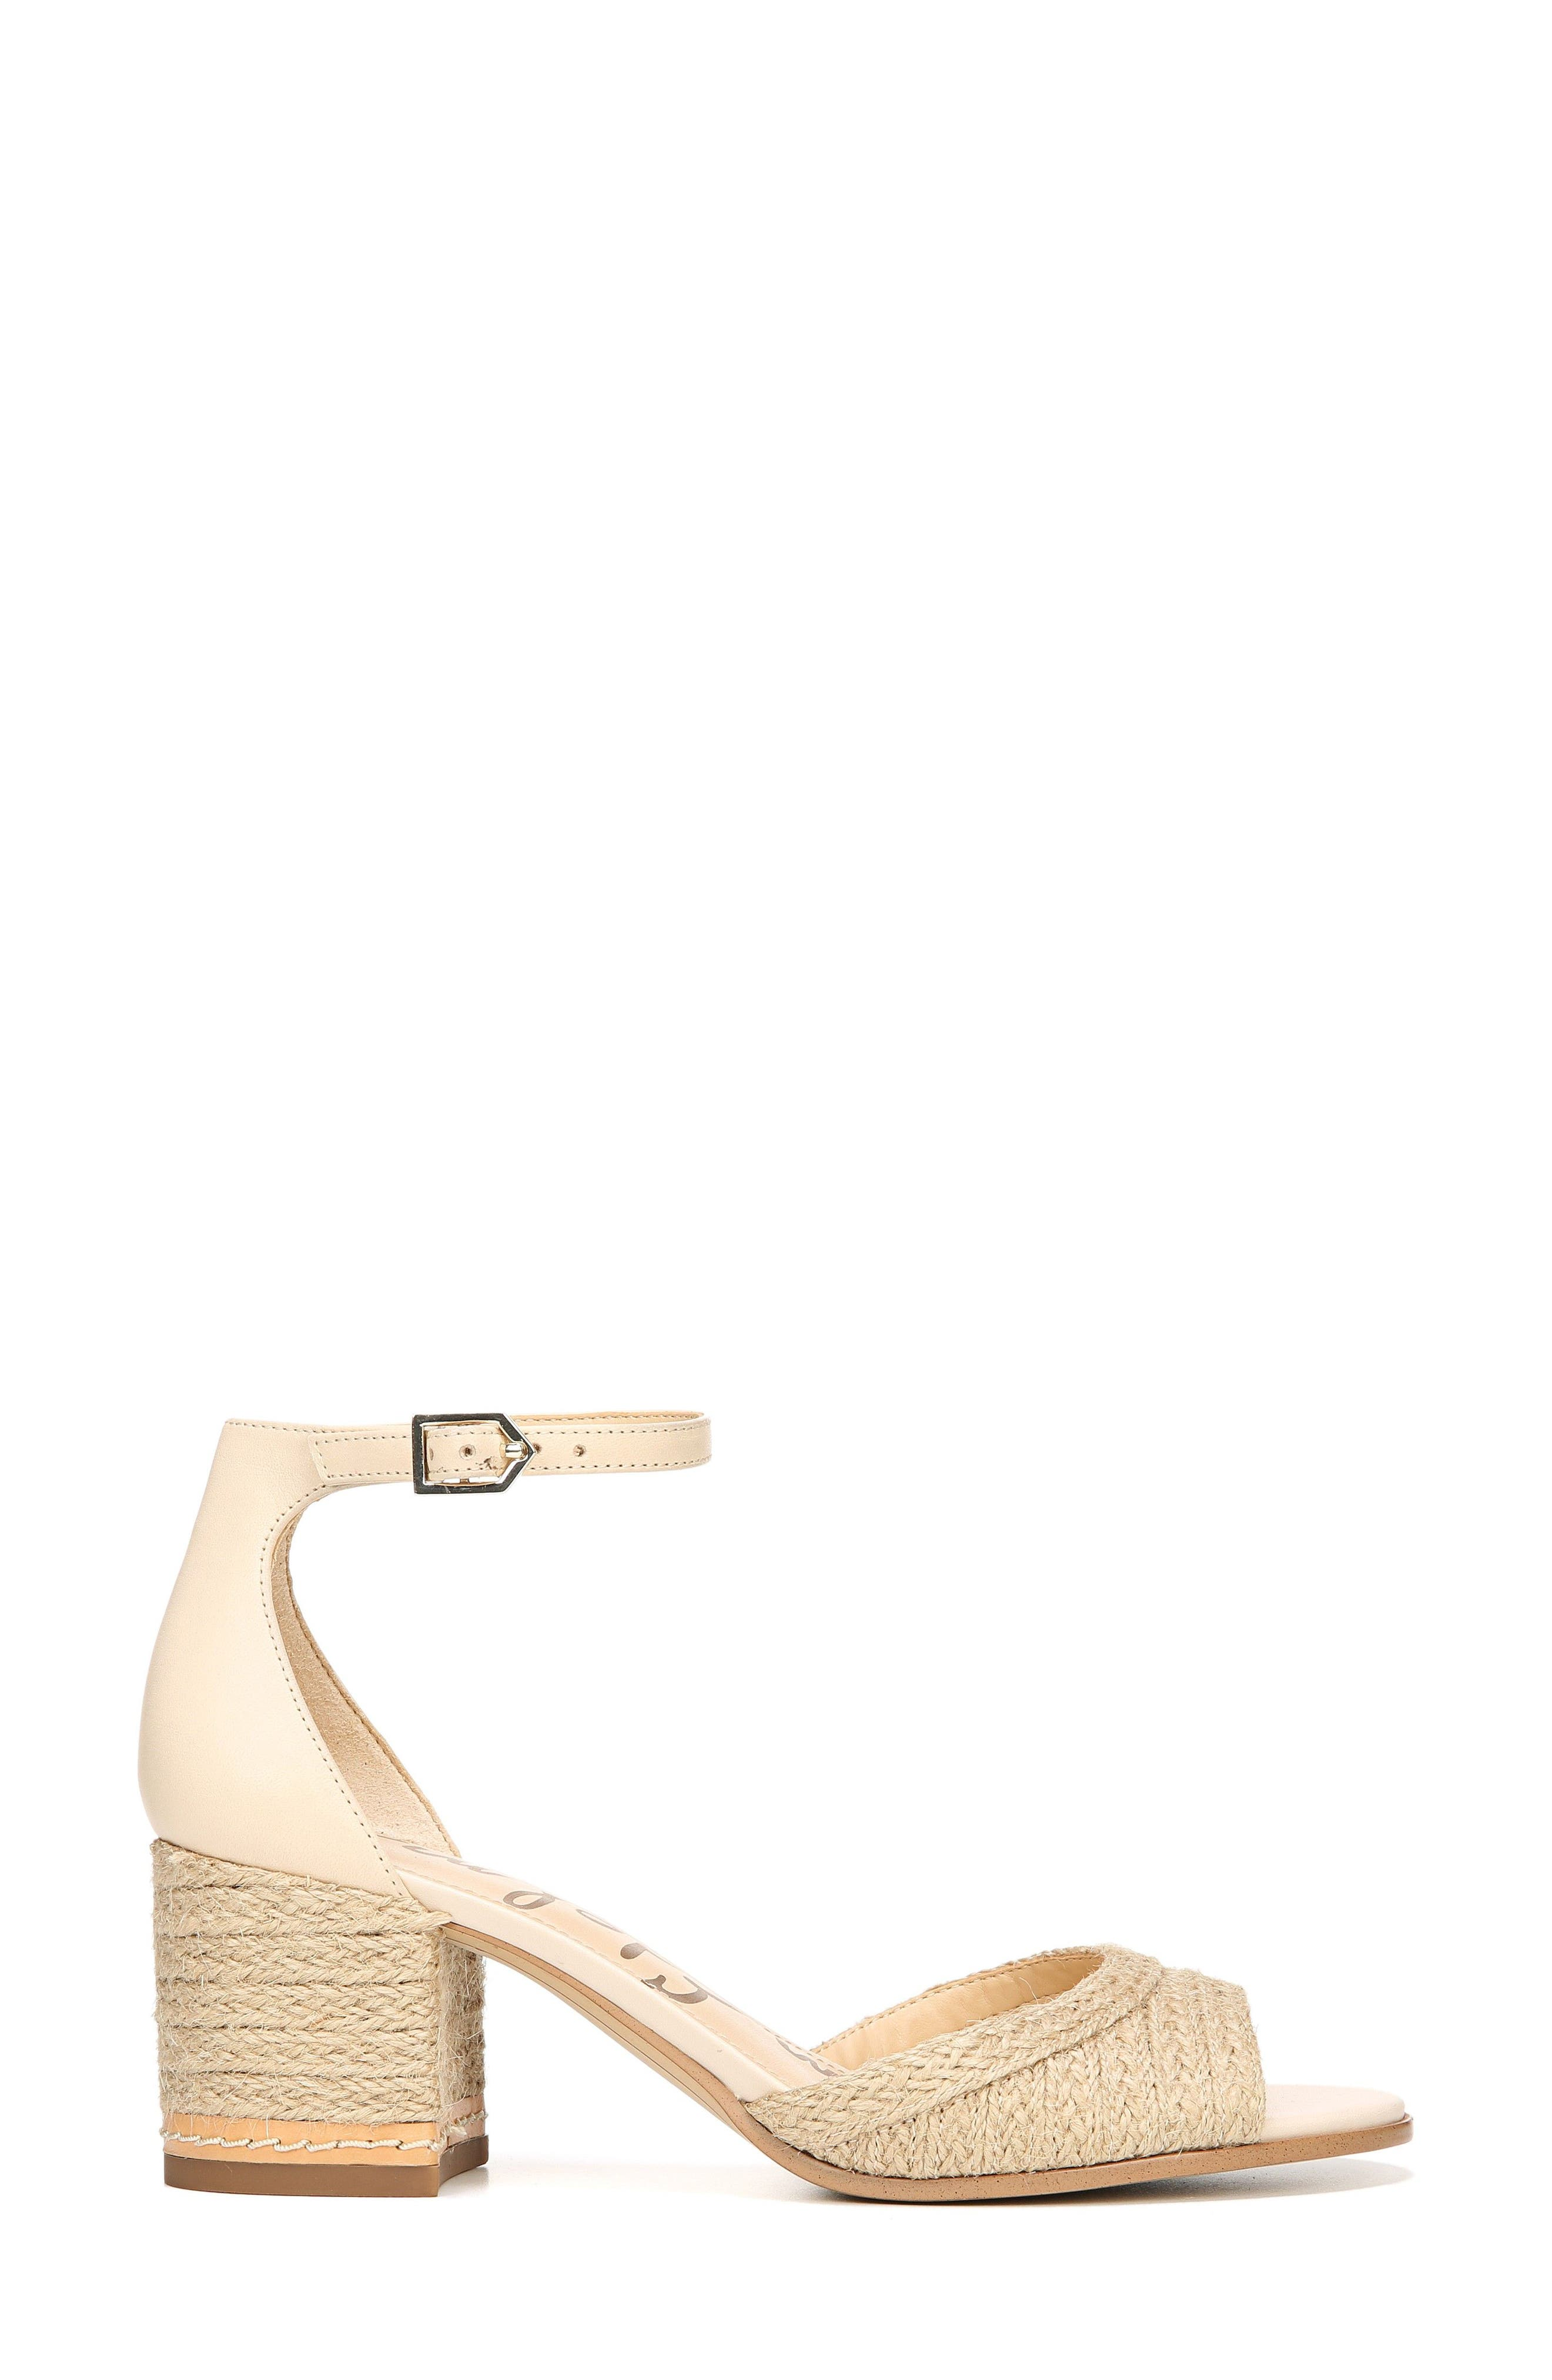 Alternate Image 3  - Sam Edelman Susie 2 Ankle Strap Sandal (Women)